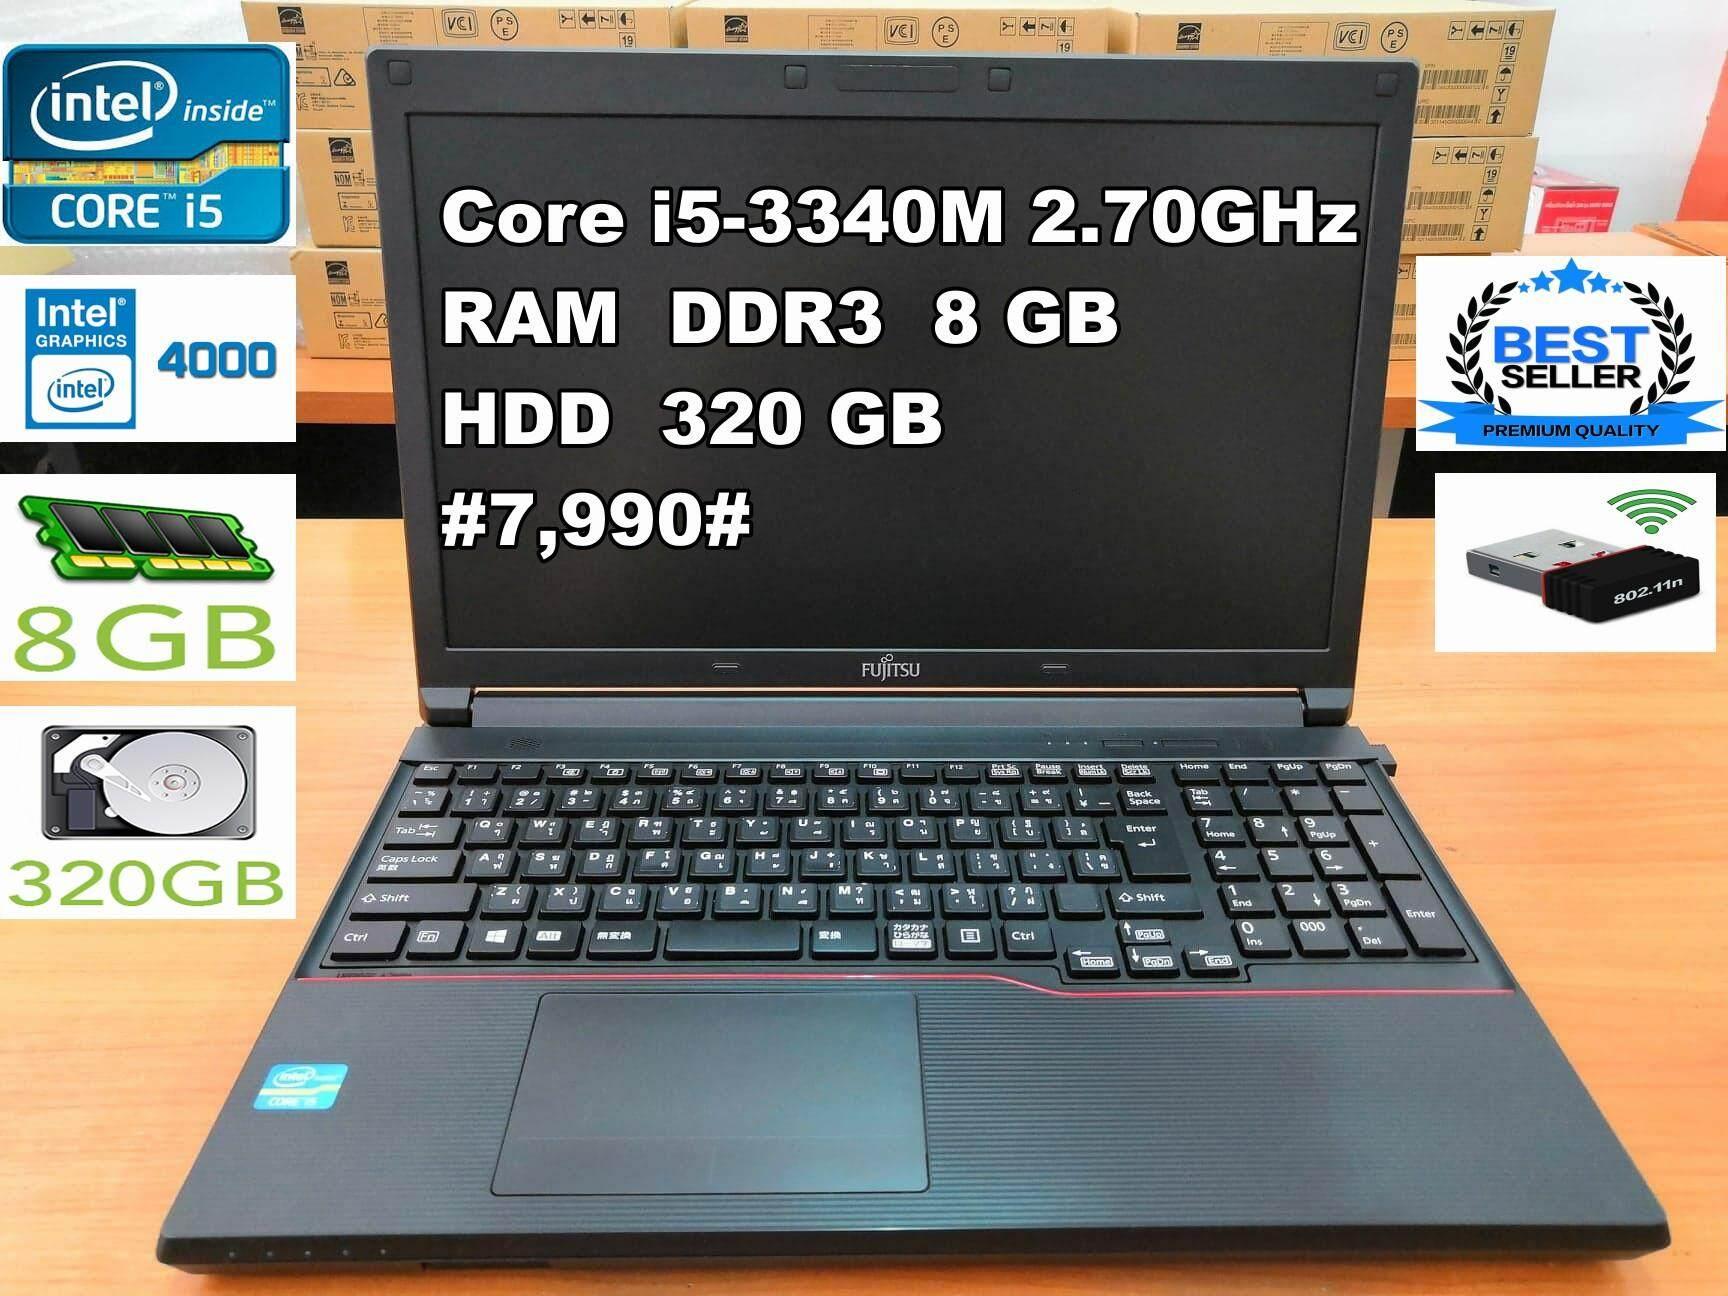 Notebook Fujitsu I5 Ram 8gb/hdd 320gb(ฟรีเกมส์ตามสั่ง)คีย์ตัวเลขแยก(gtav/pubg Lite/pb/hon/rov/fifa4/freefire/ragnarok M/pes/bf4/cs/the Sim 4)ทดสอบแล้วเล่นได้ By Saby Computer.